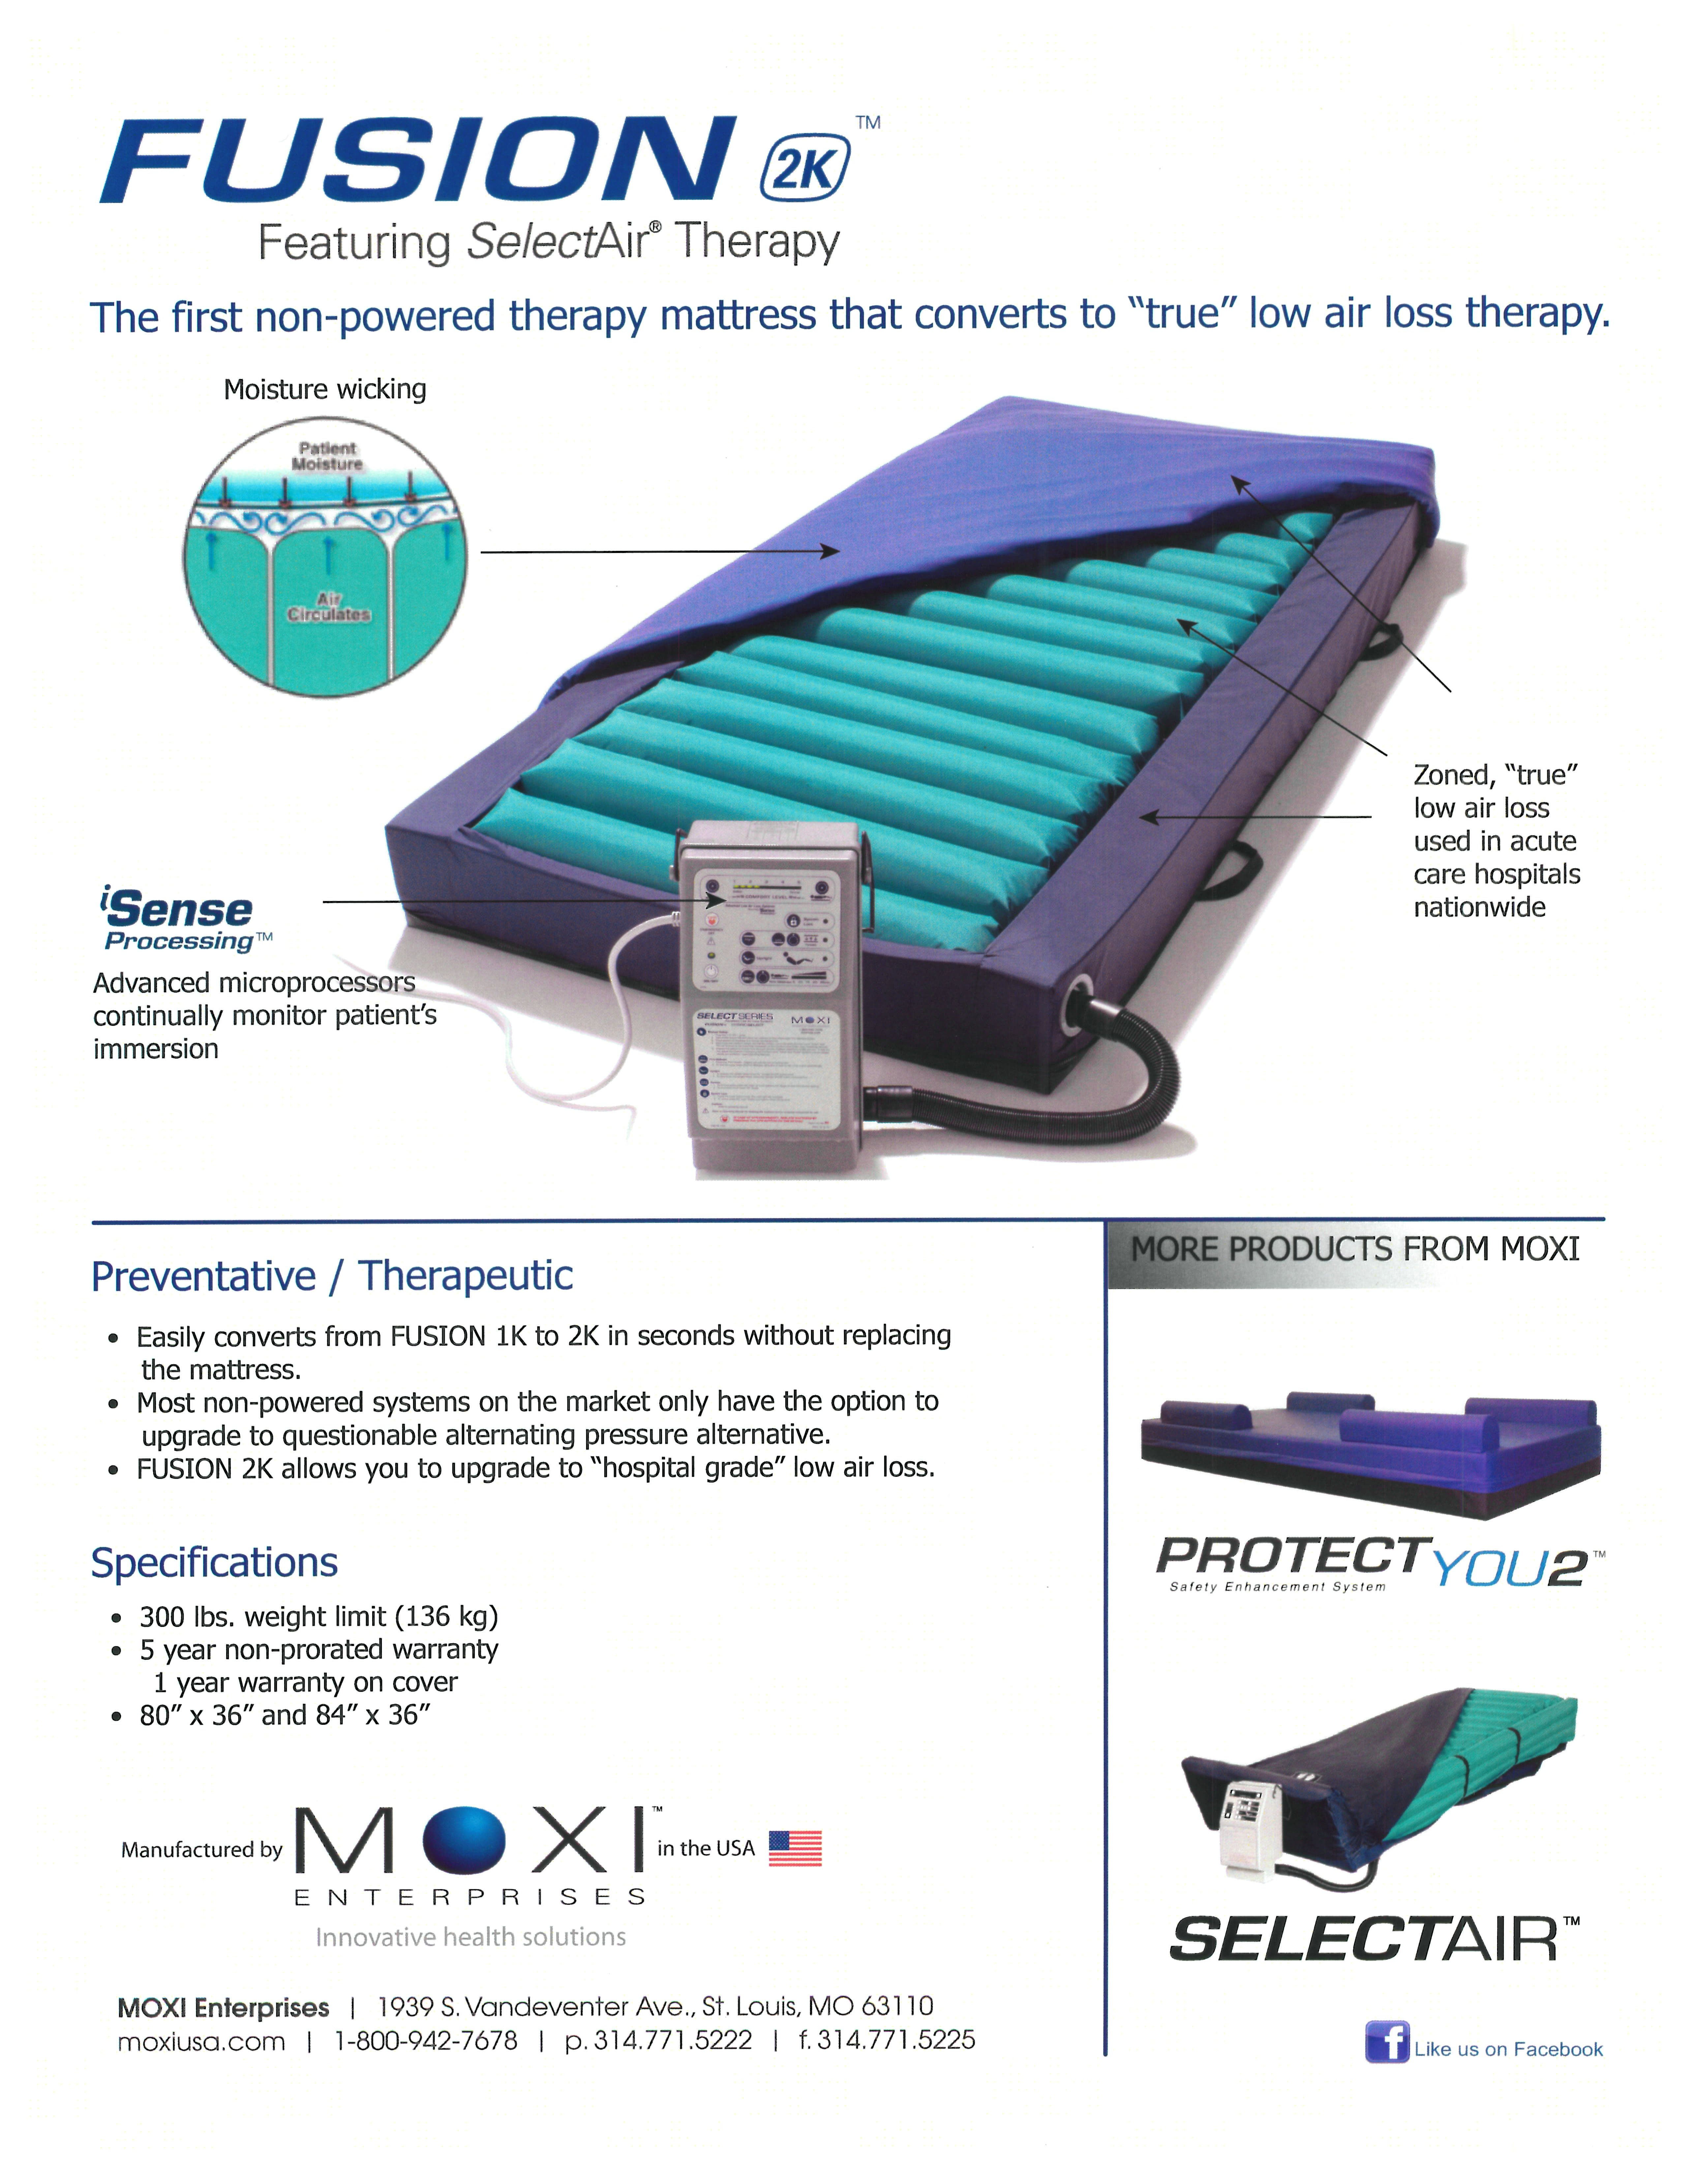 moxi fusion 2k medical mattress moxi fusion 1k xc 2k pinterest